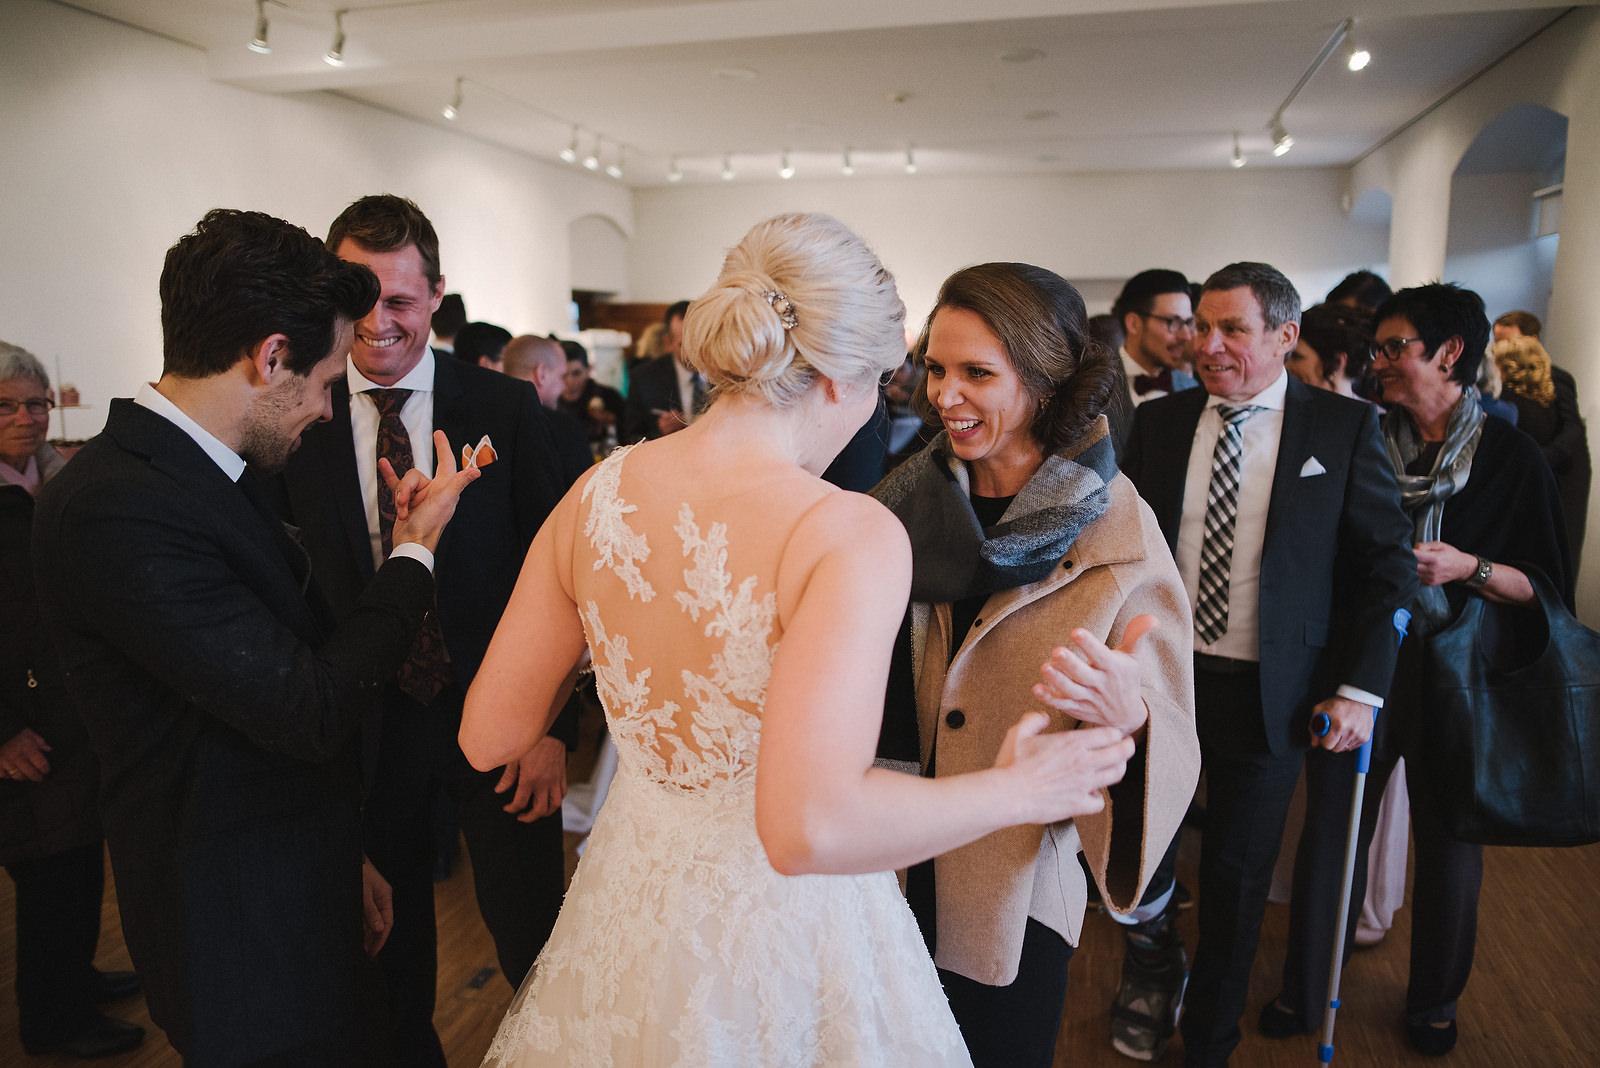 Fotograf Konstanz - Silvester Wedding in Hagnau / Friedrichshafen at Lake of Constance  - 30 -